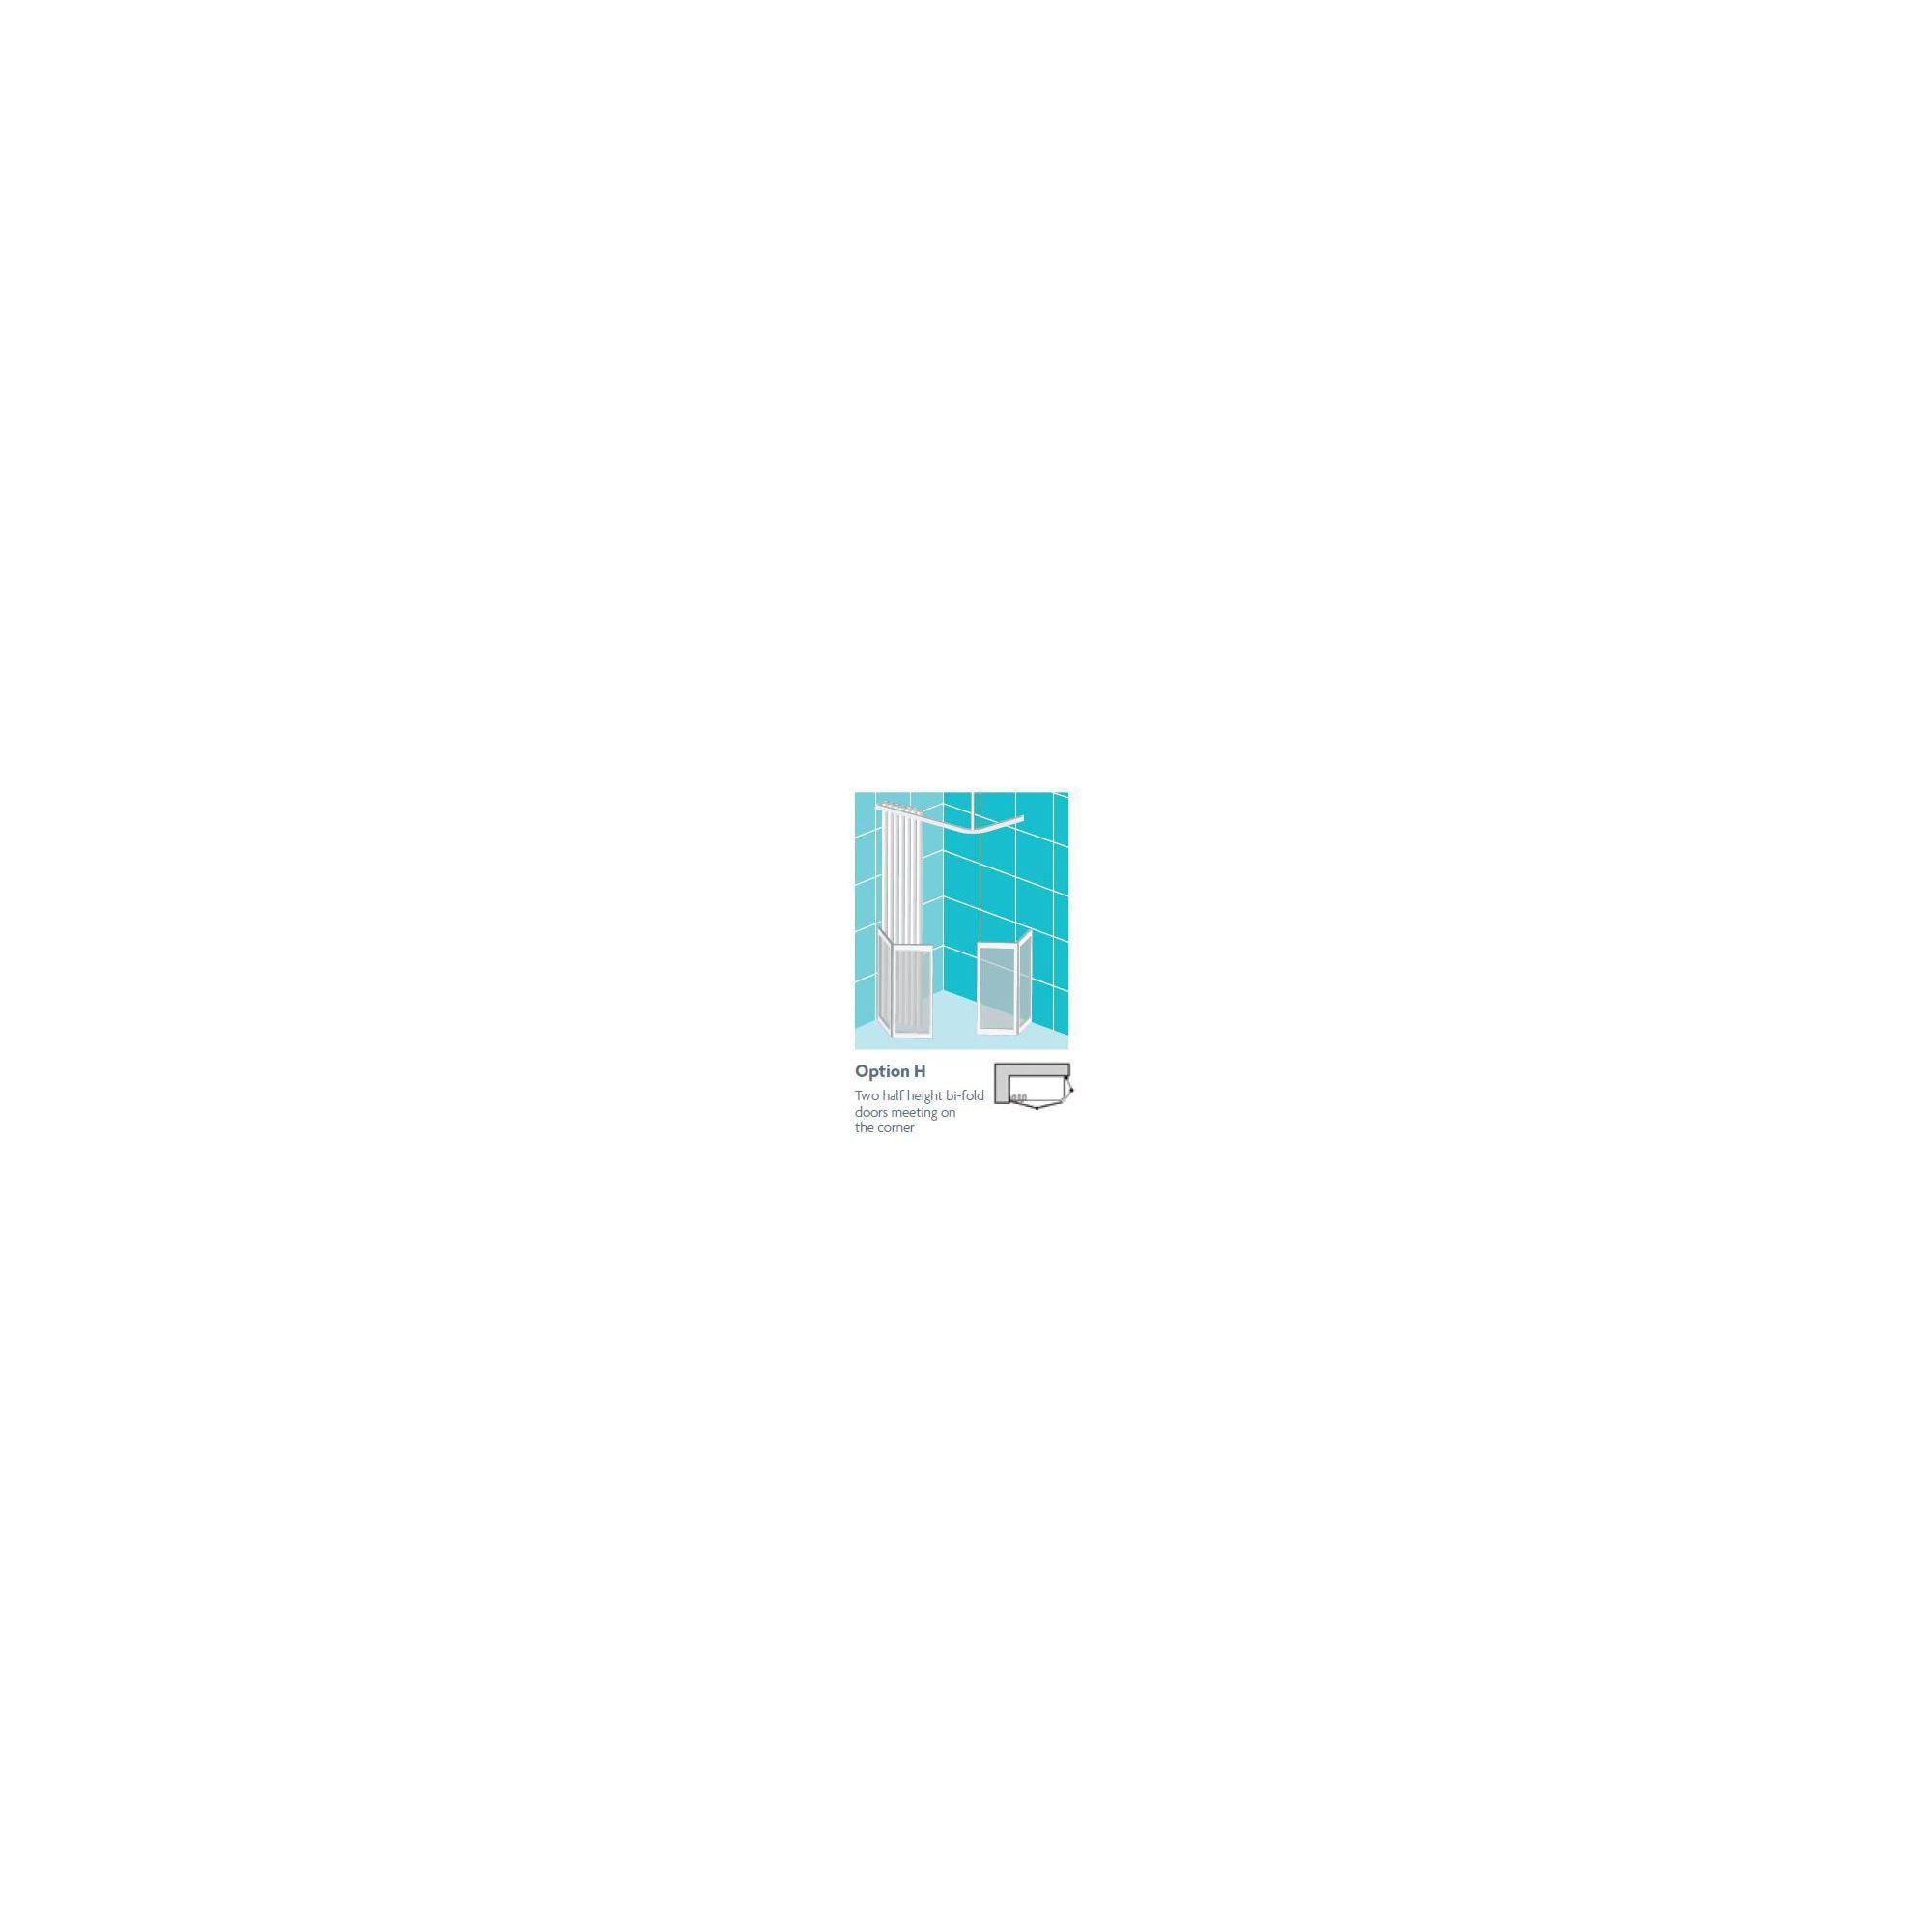 Impey Supreme Corner Door Option H 900mm x 900mm at Tesco Direct